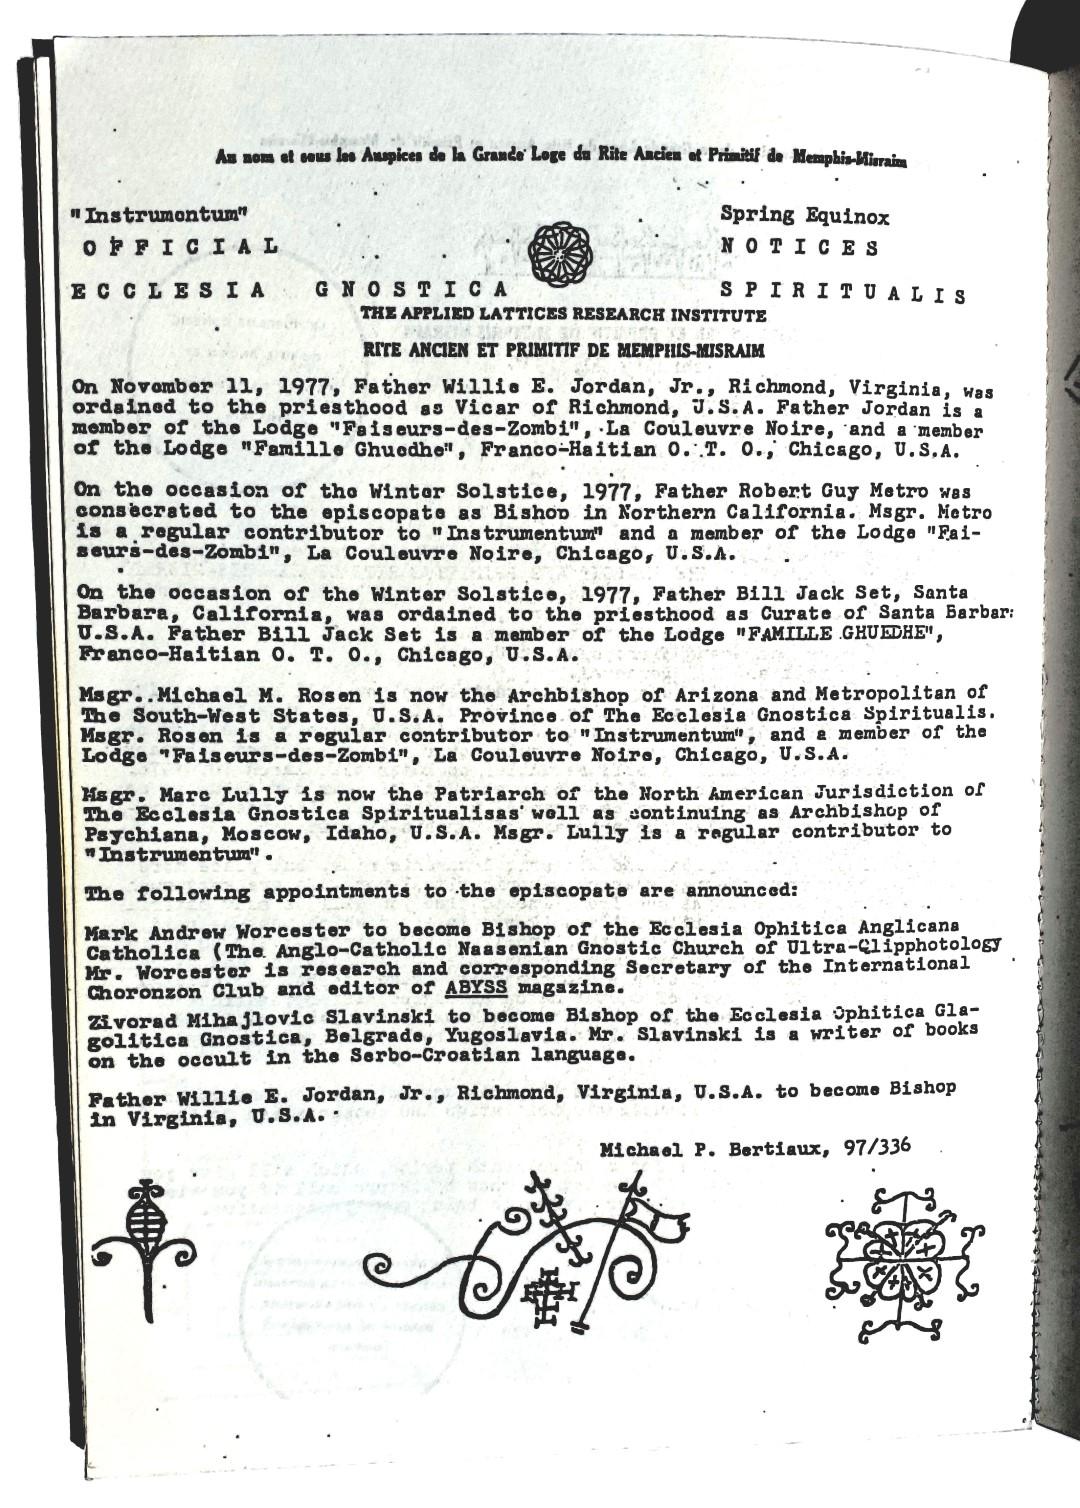 1977-11-11 Michael Paul Bertiaux  Zivorad Mihajlovic Slavinski